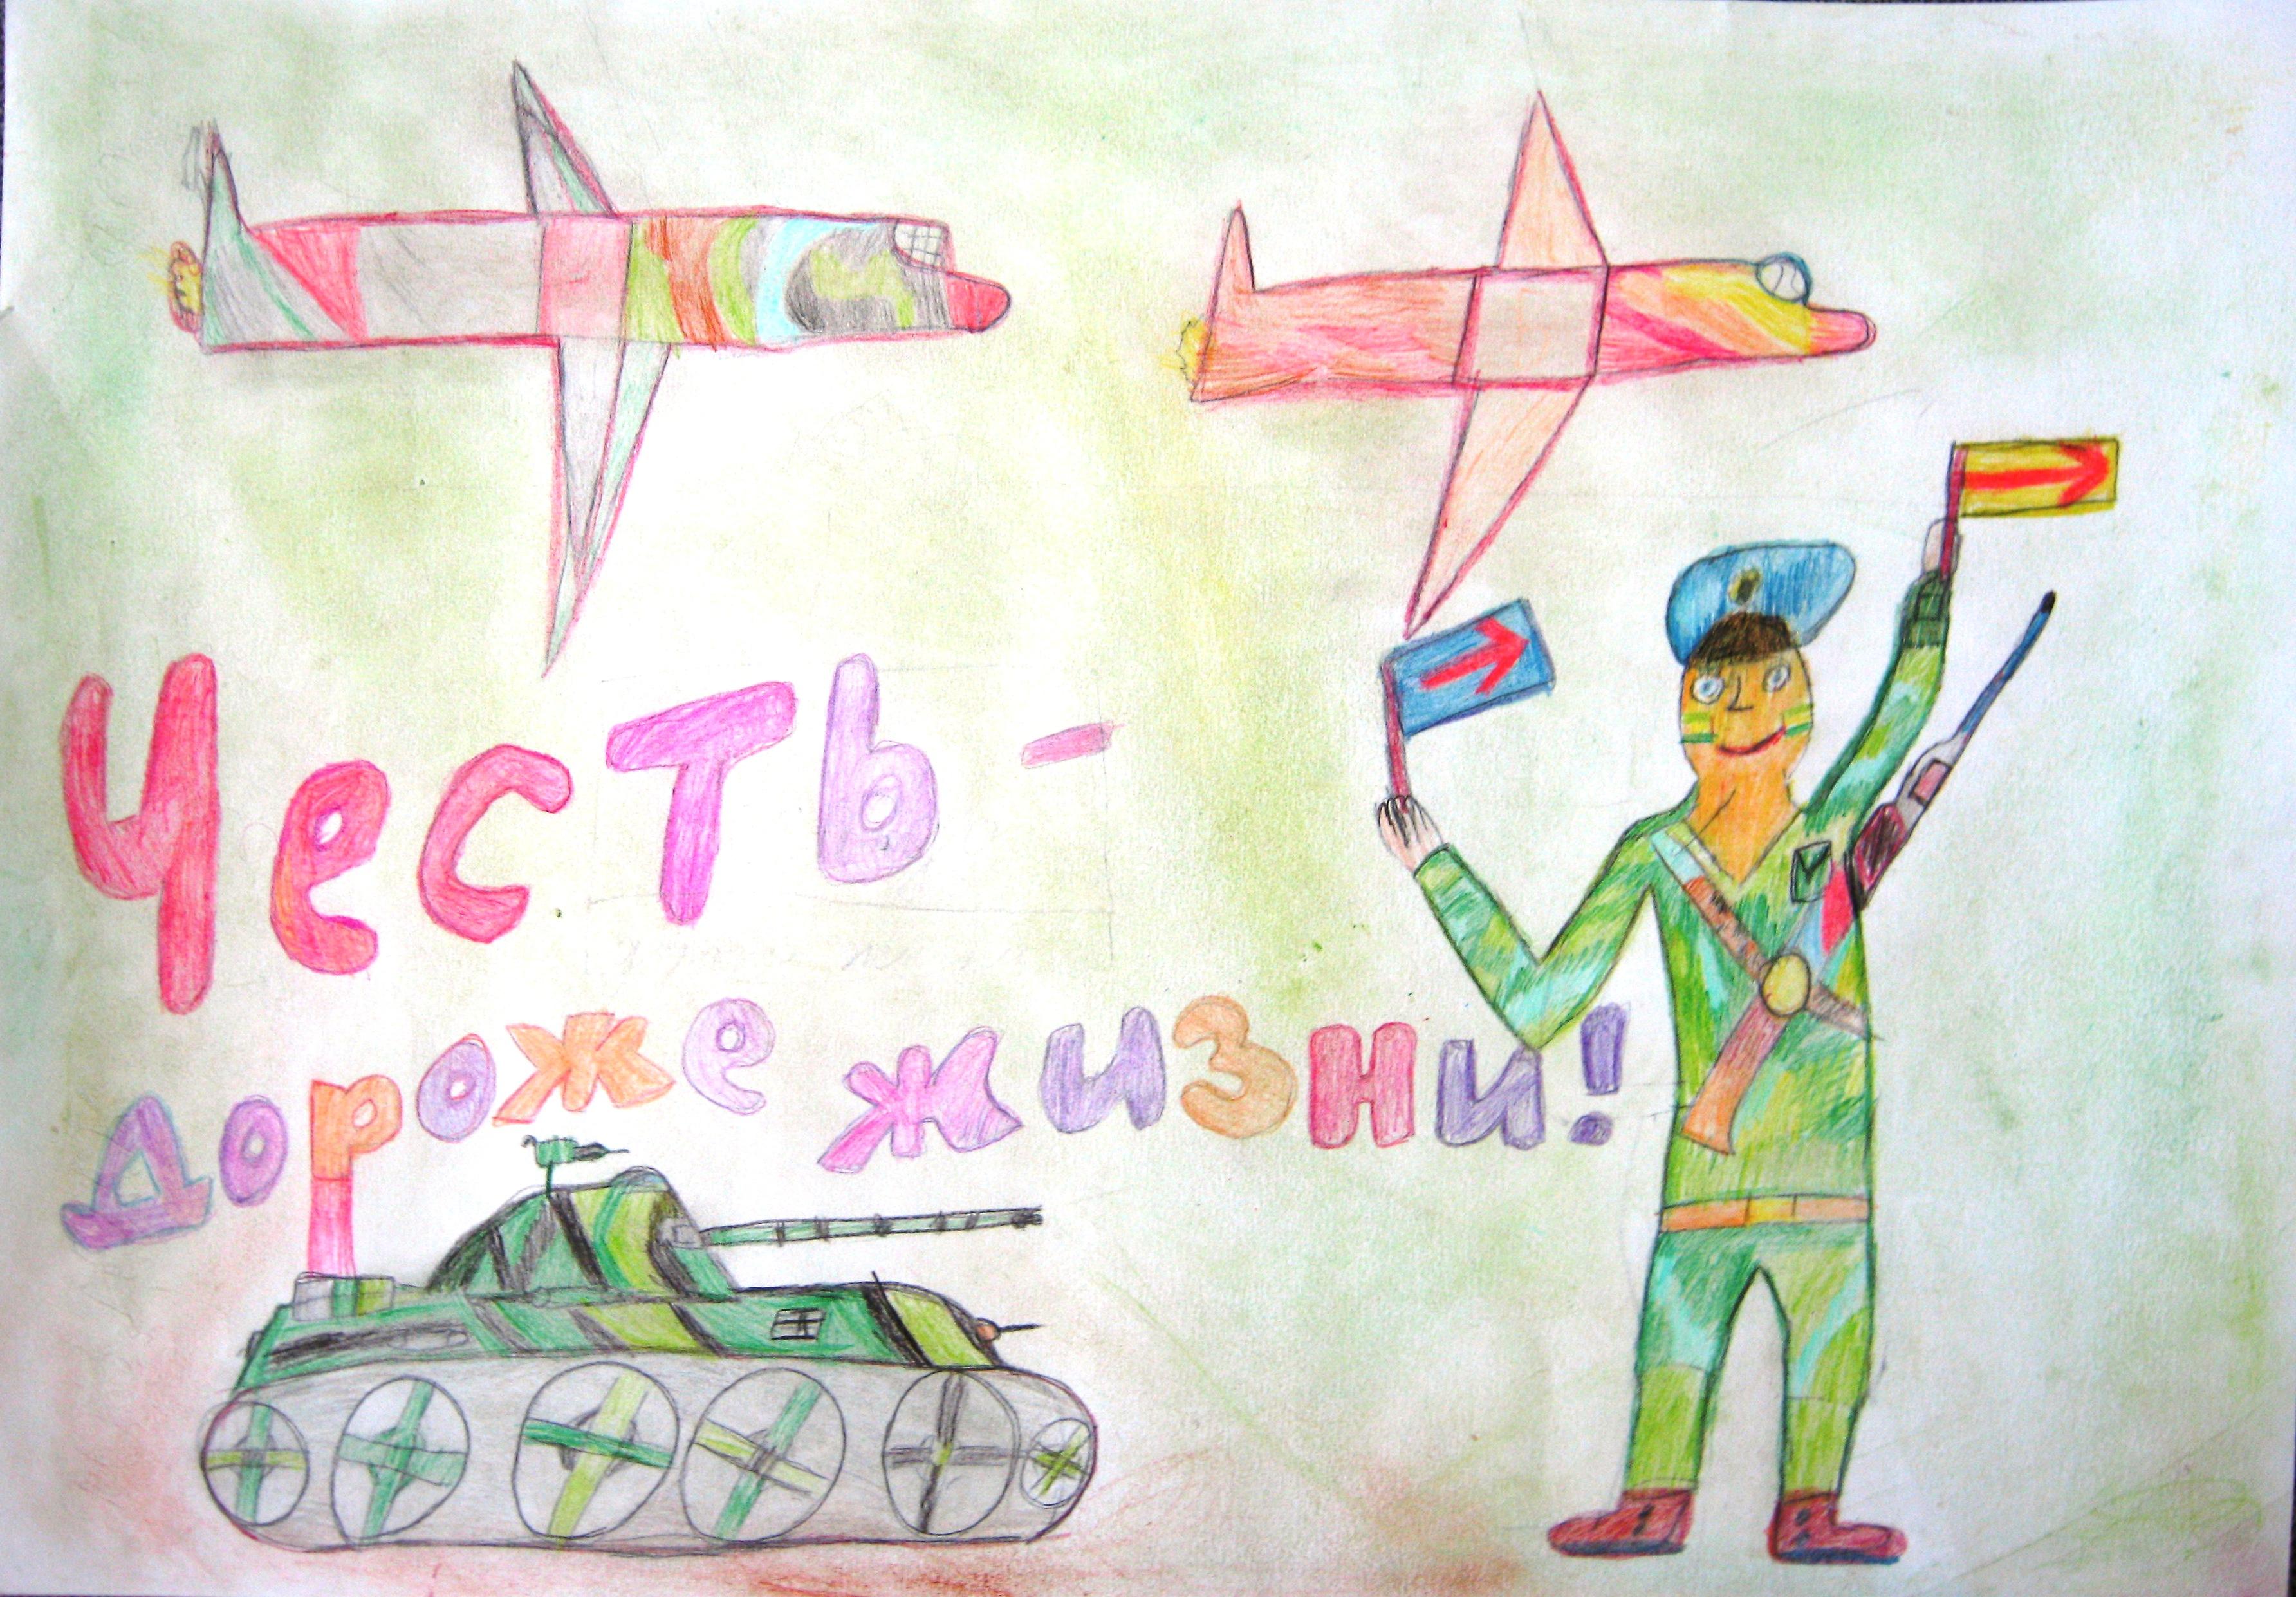 Рахно Александр, 8 лет, СОШ № 135